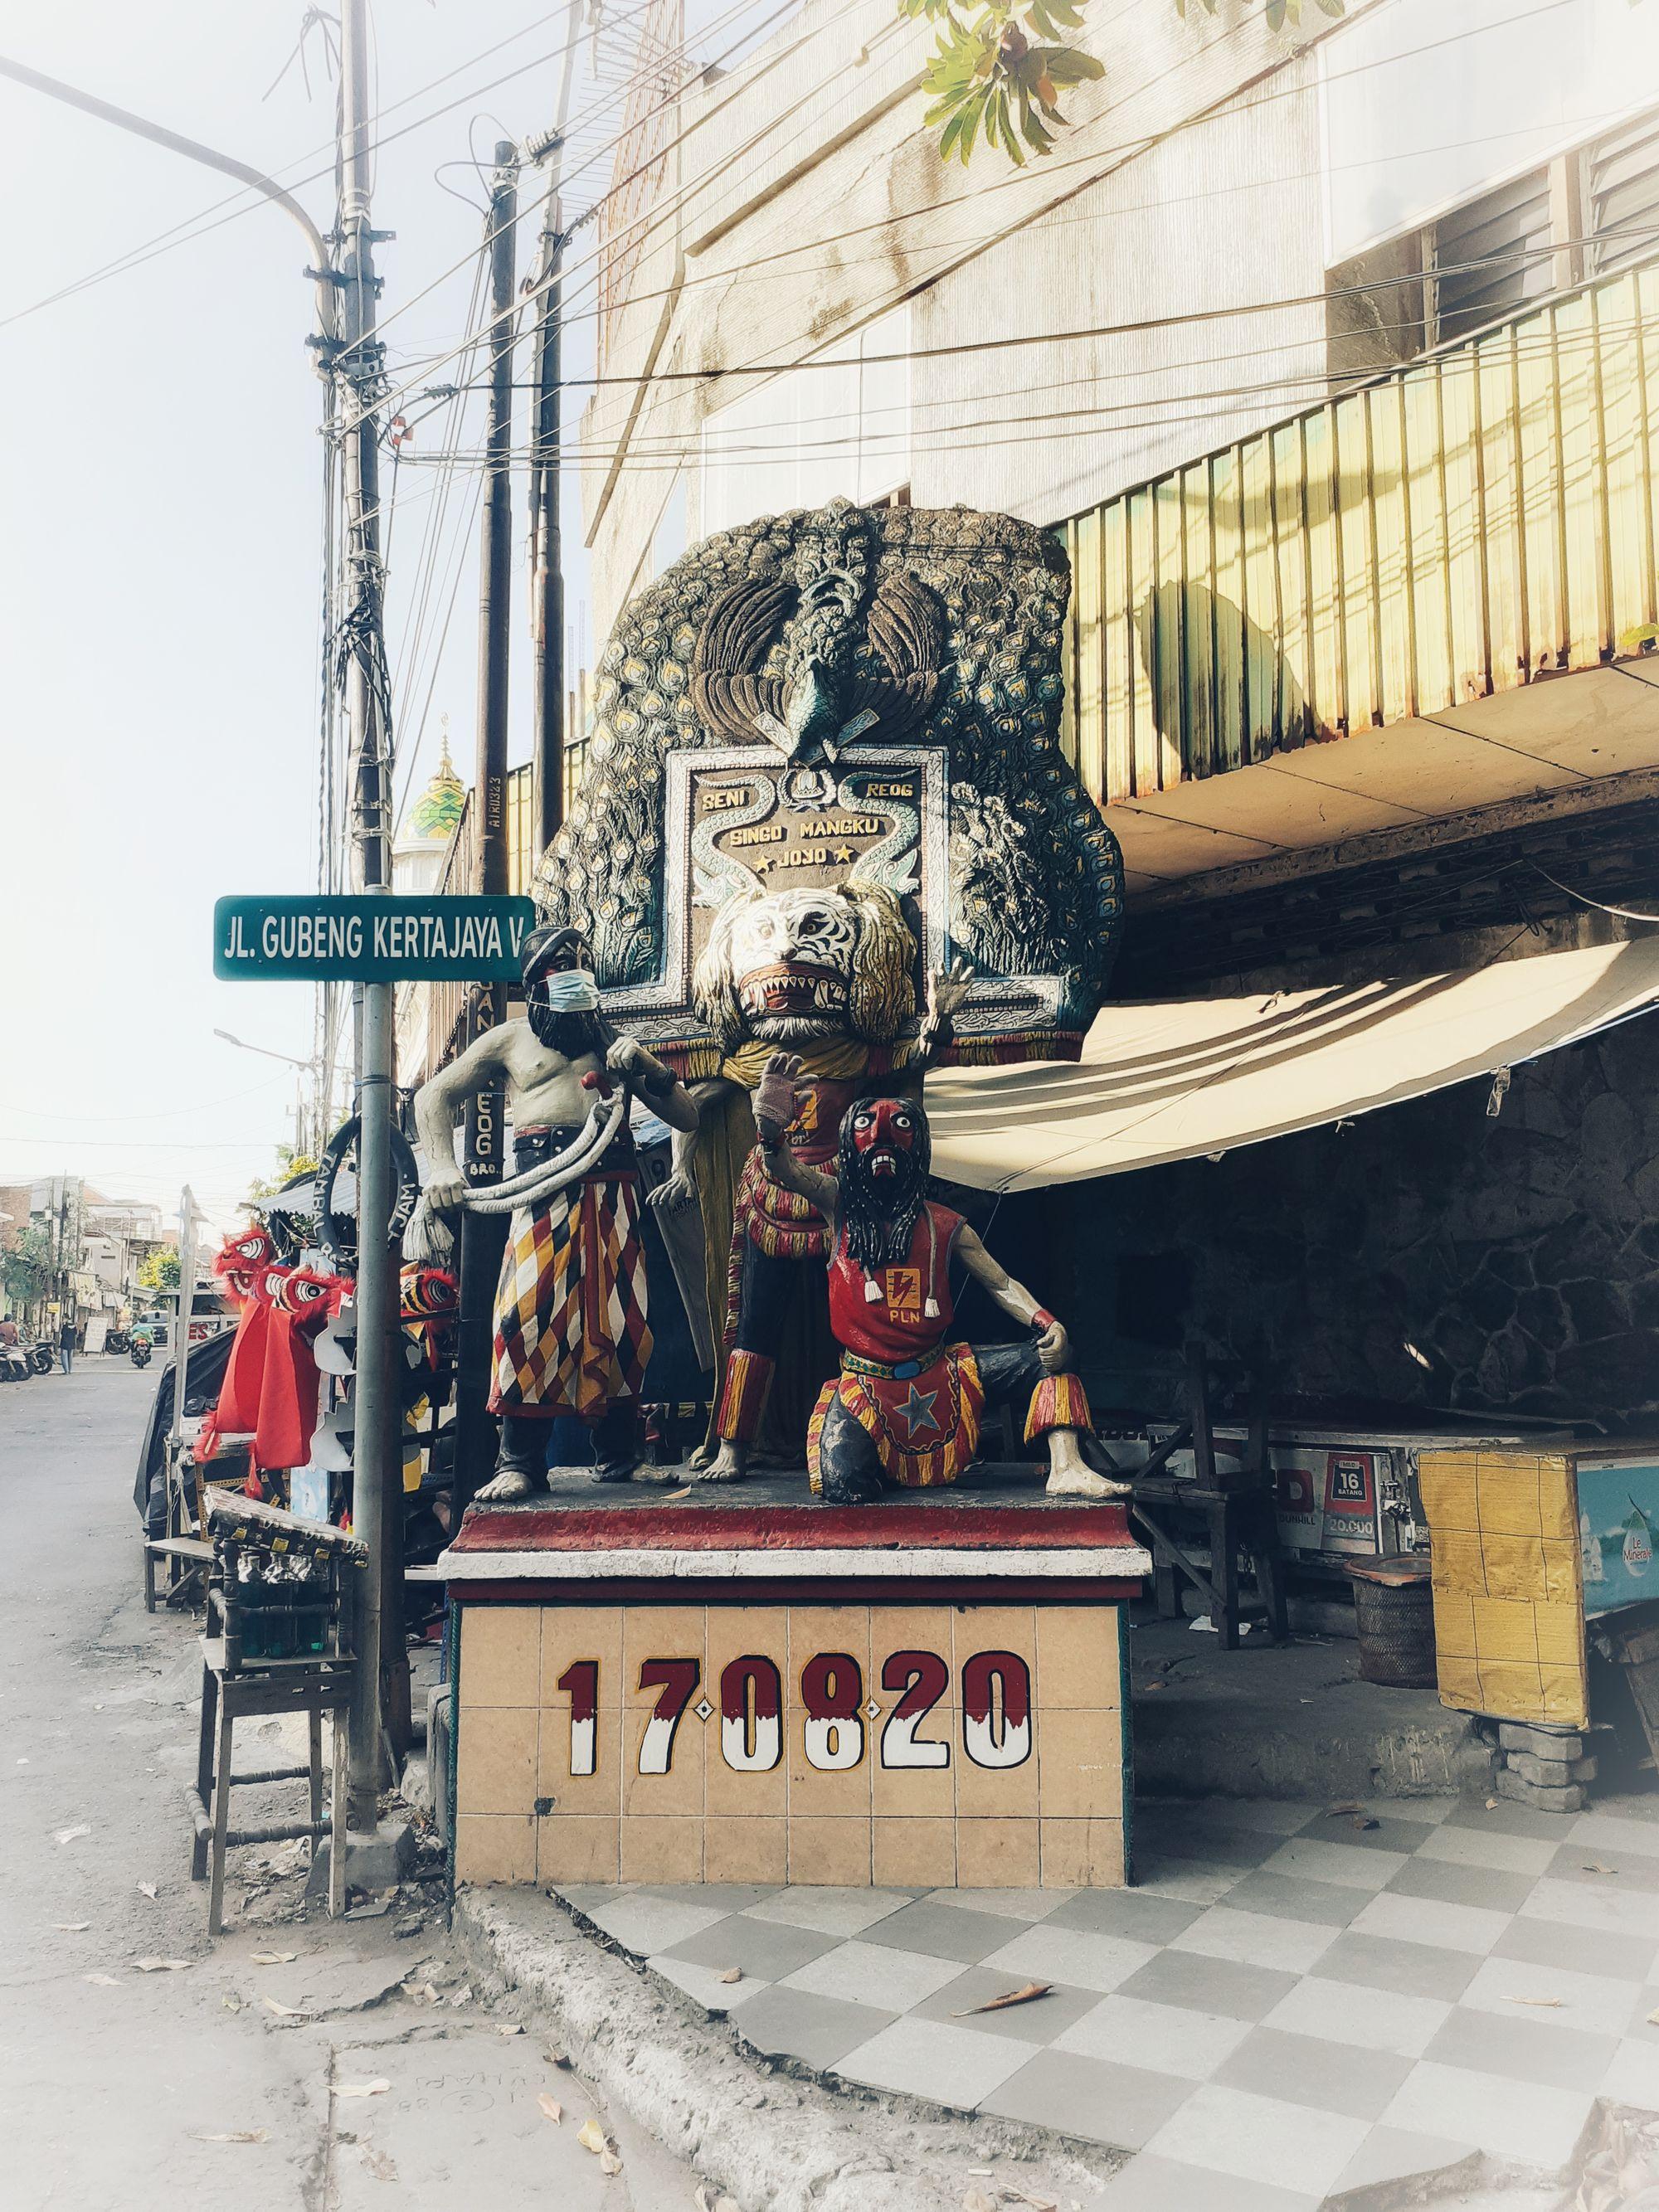 Gang Reyog Kertajaya, Bertahan di Tengah Hiruk-pikuk Surabaya